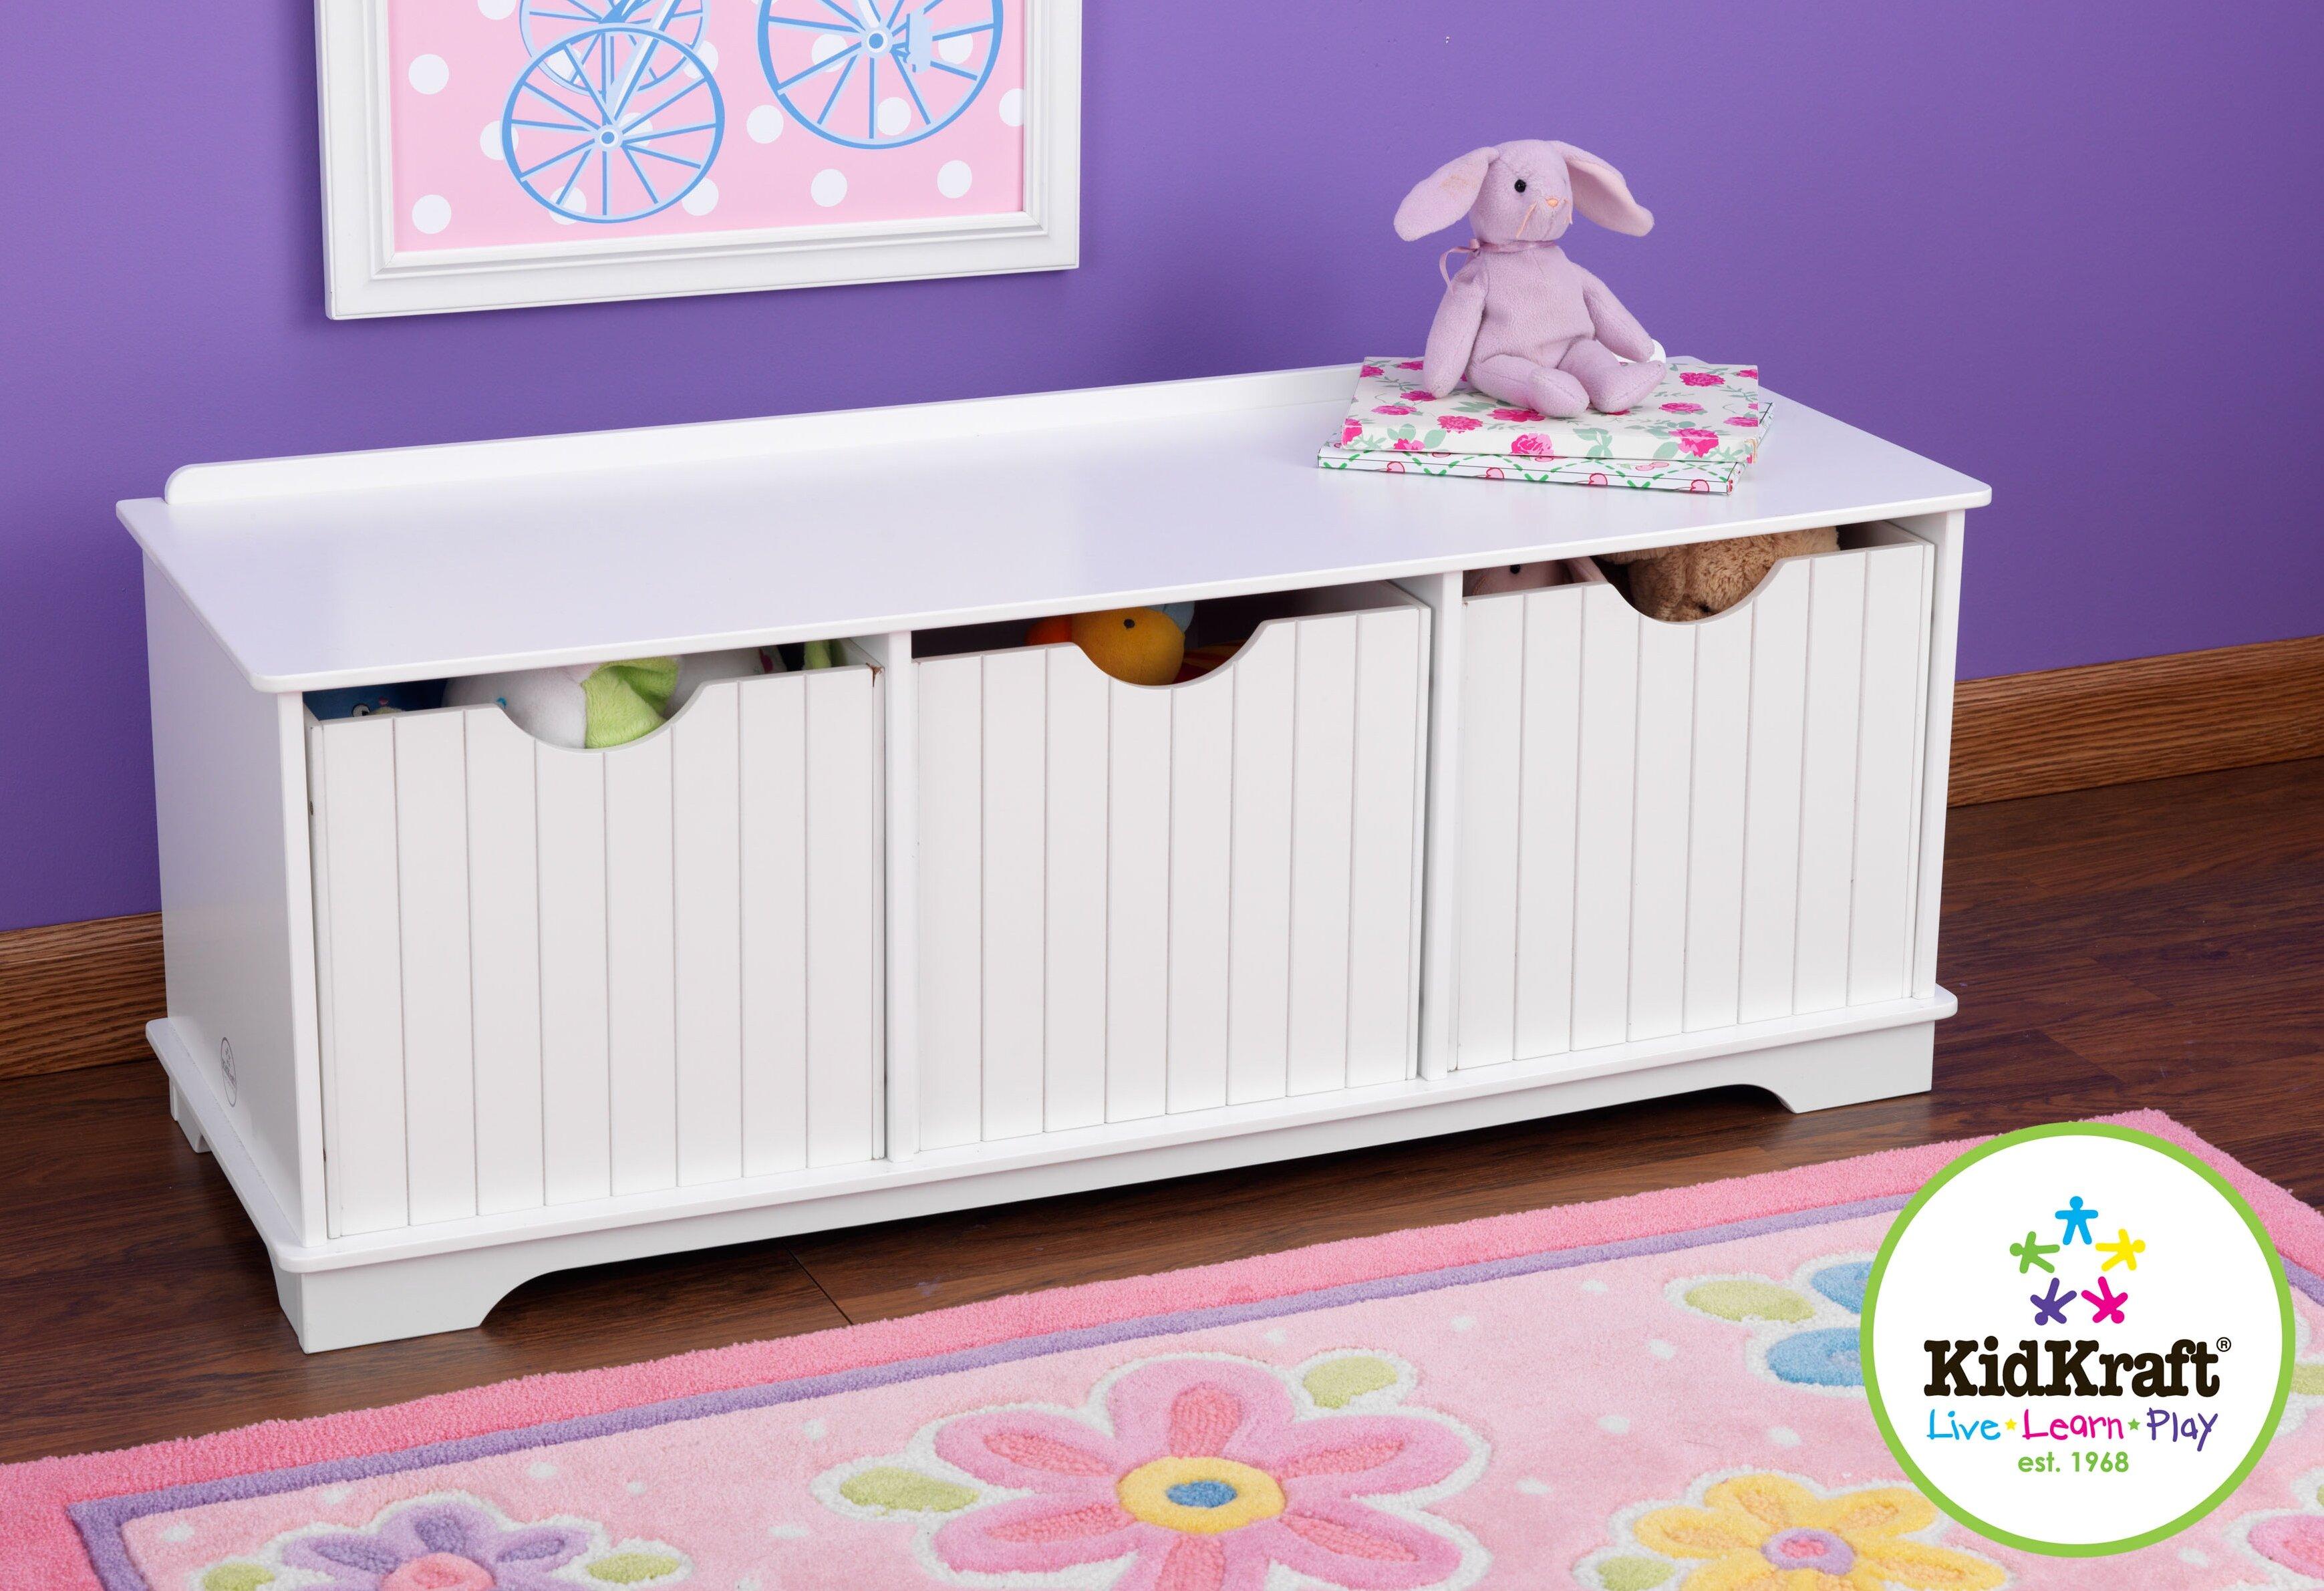 & KidKraft Nantucket Storage Bench u0026 Reviews | Wayfair